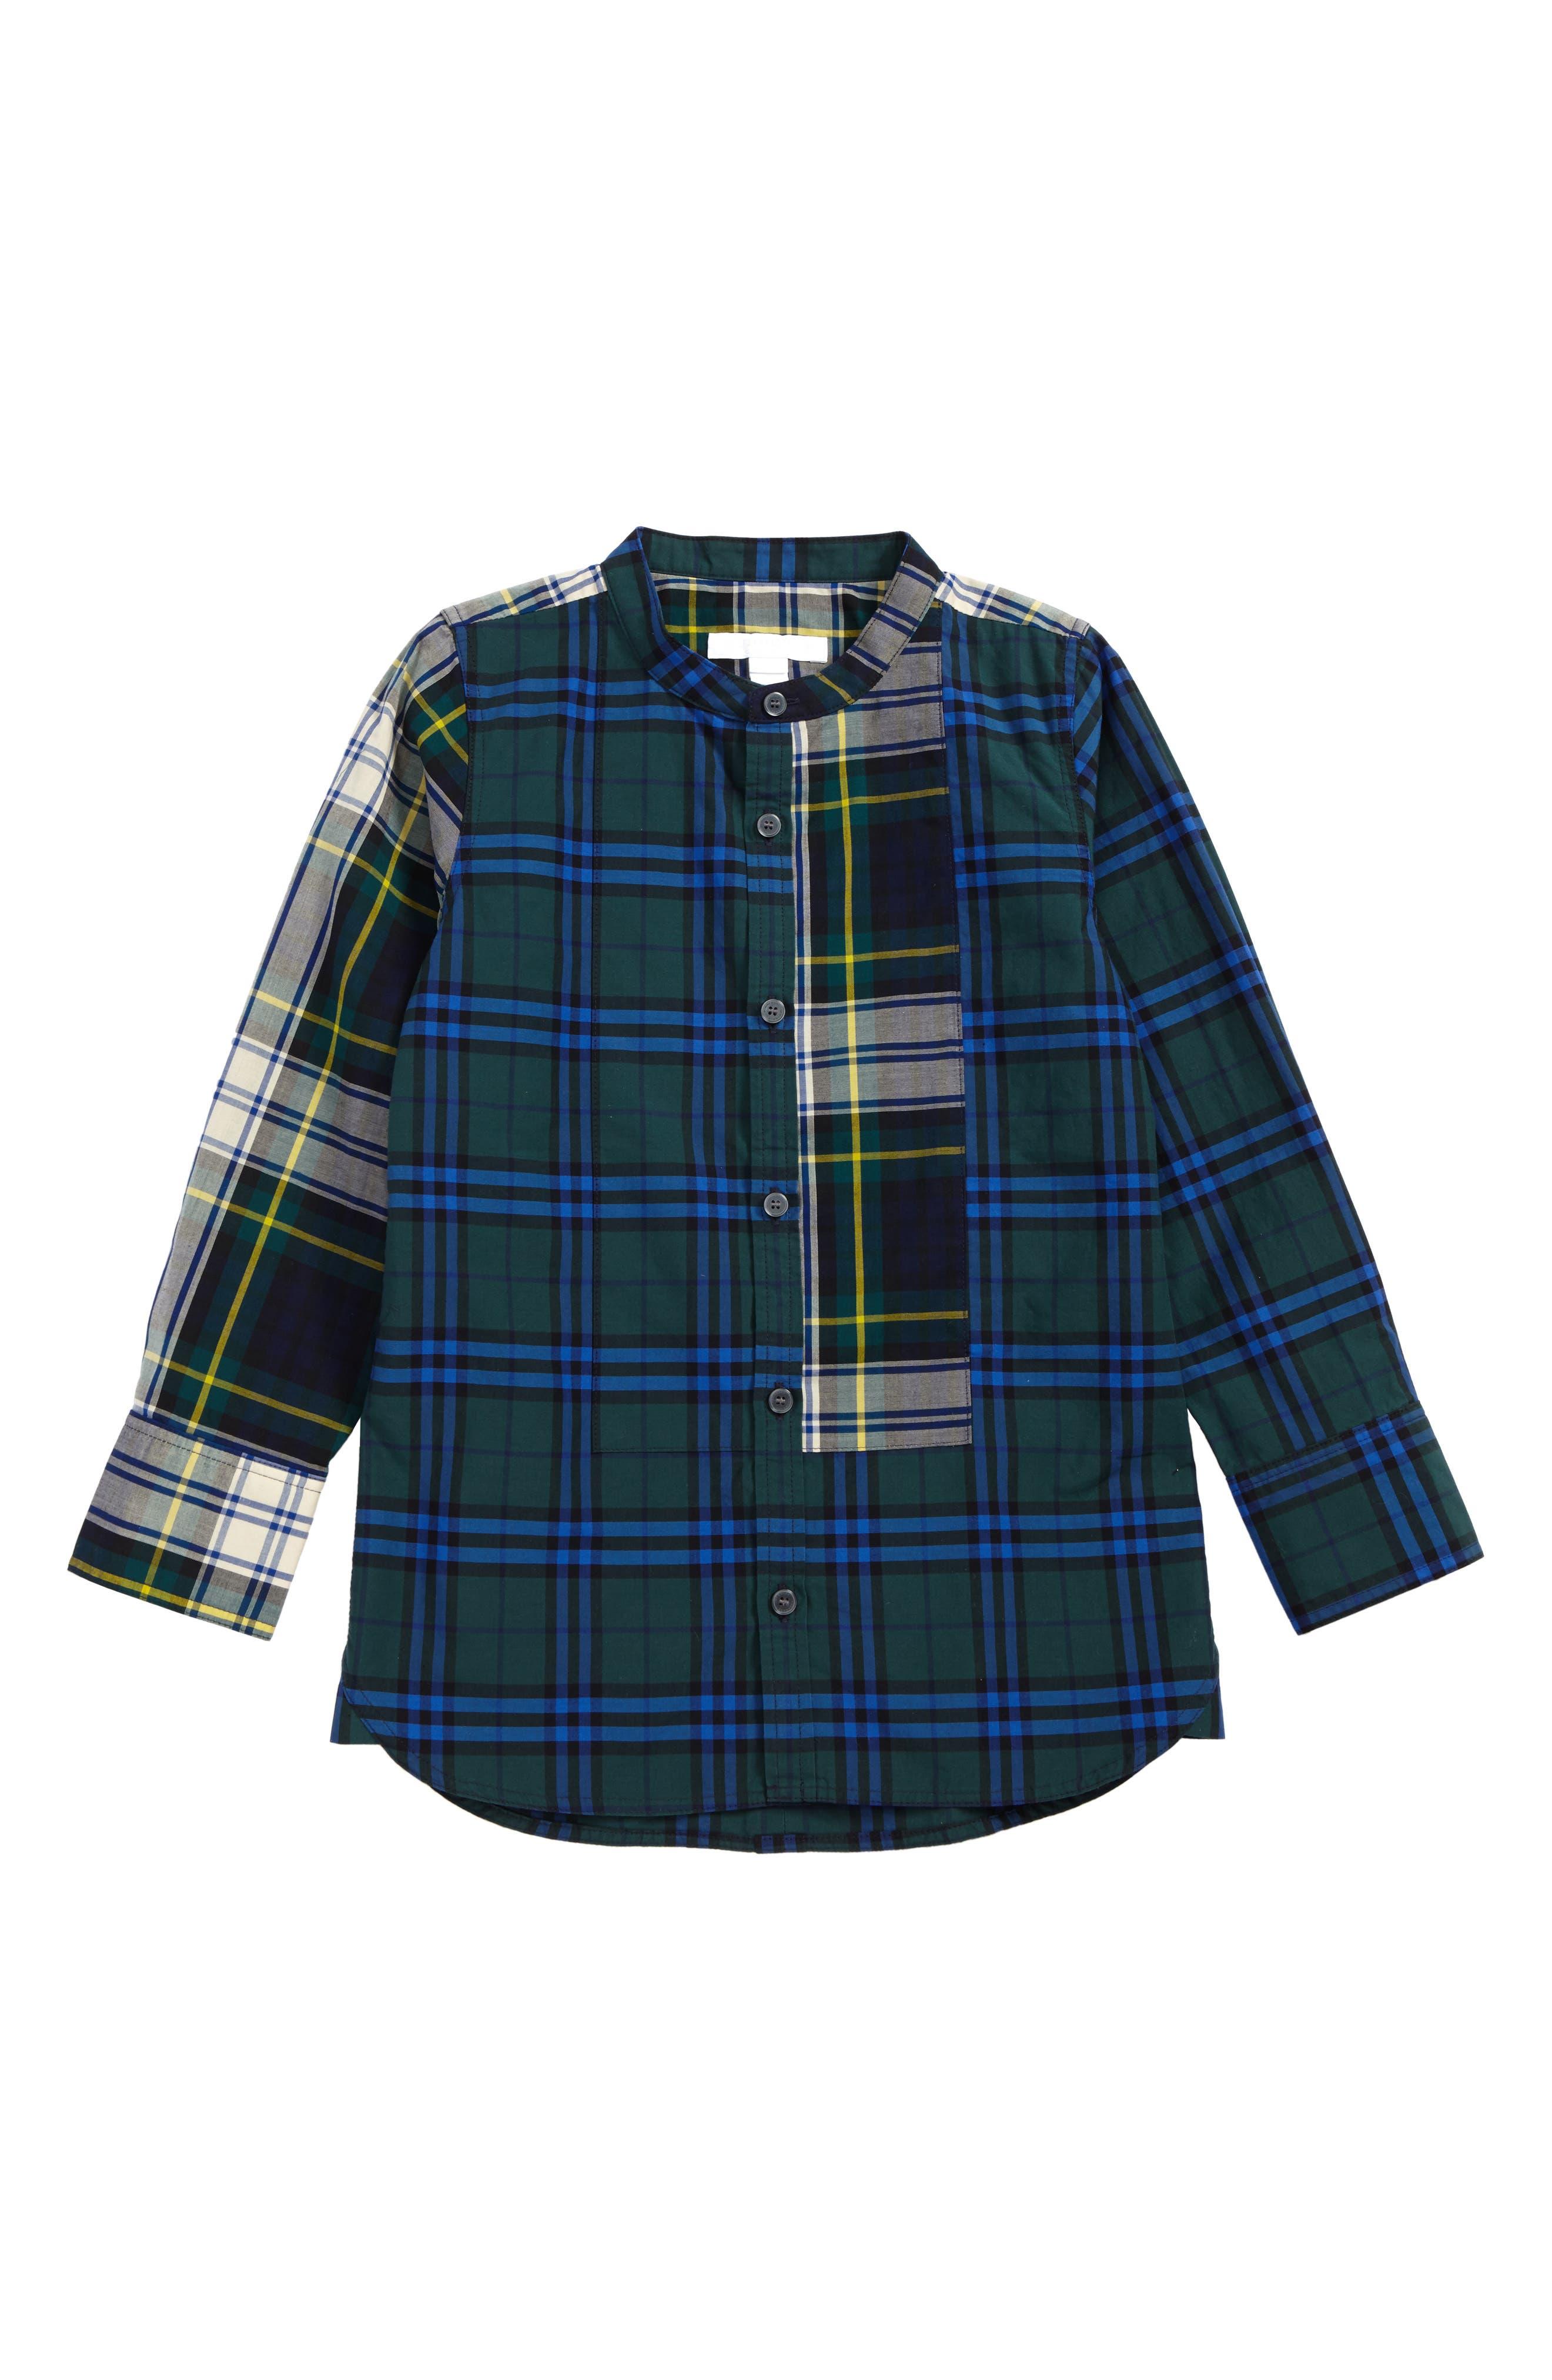 Argus Check Print Woven Shirt,                             Main thumbnail 1, color,                             341